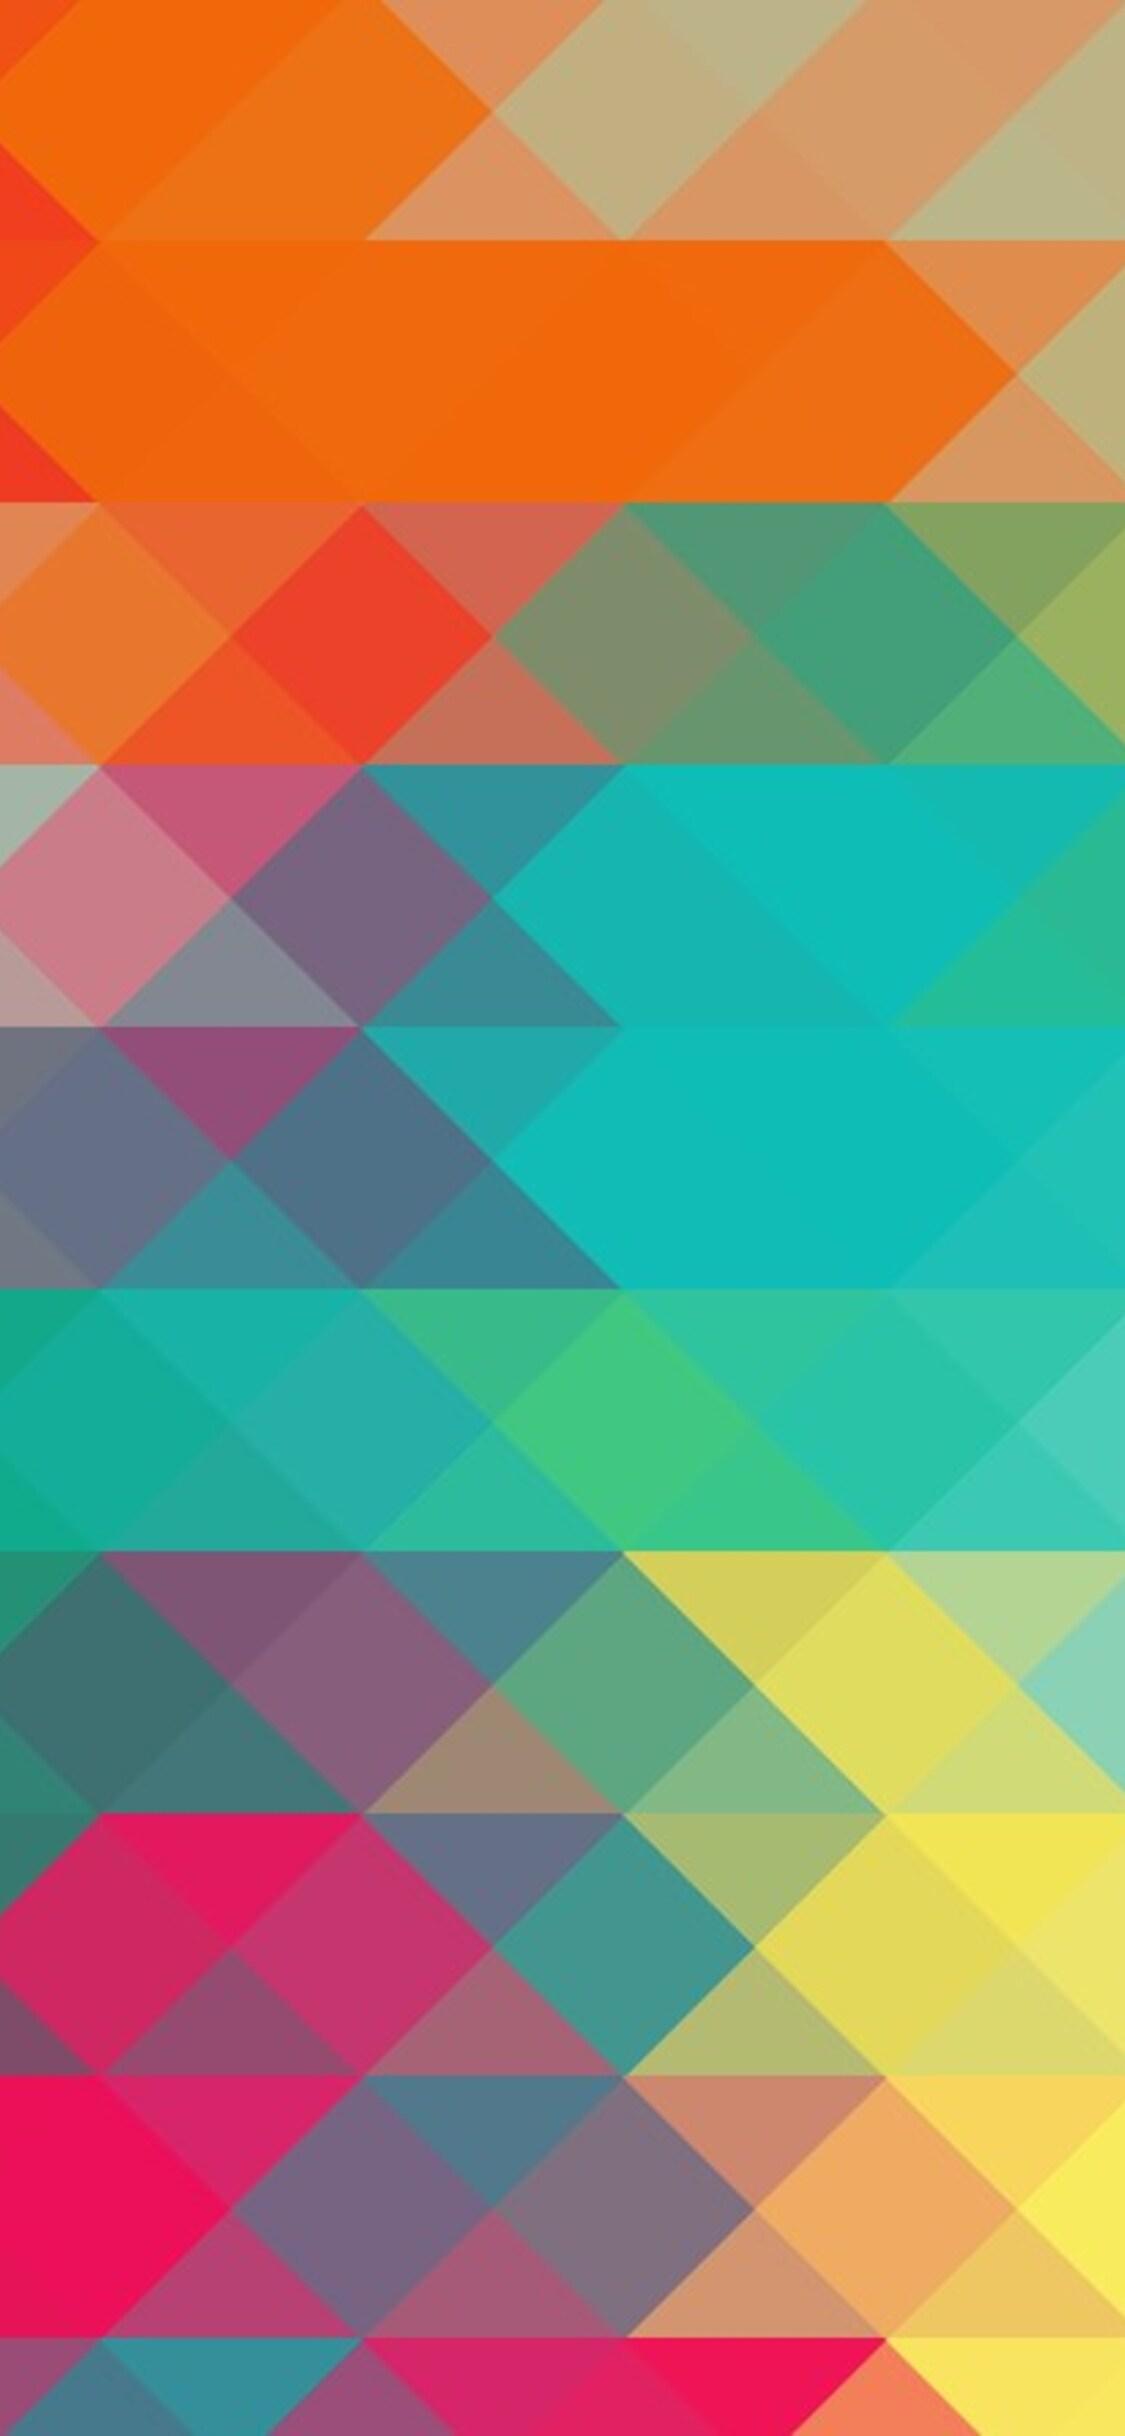 Iphone X Abstract Wallpaper 4k 1125x2436 Iron Man Abstract Art